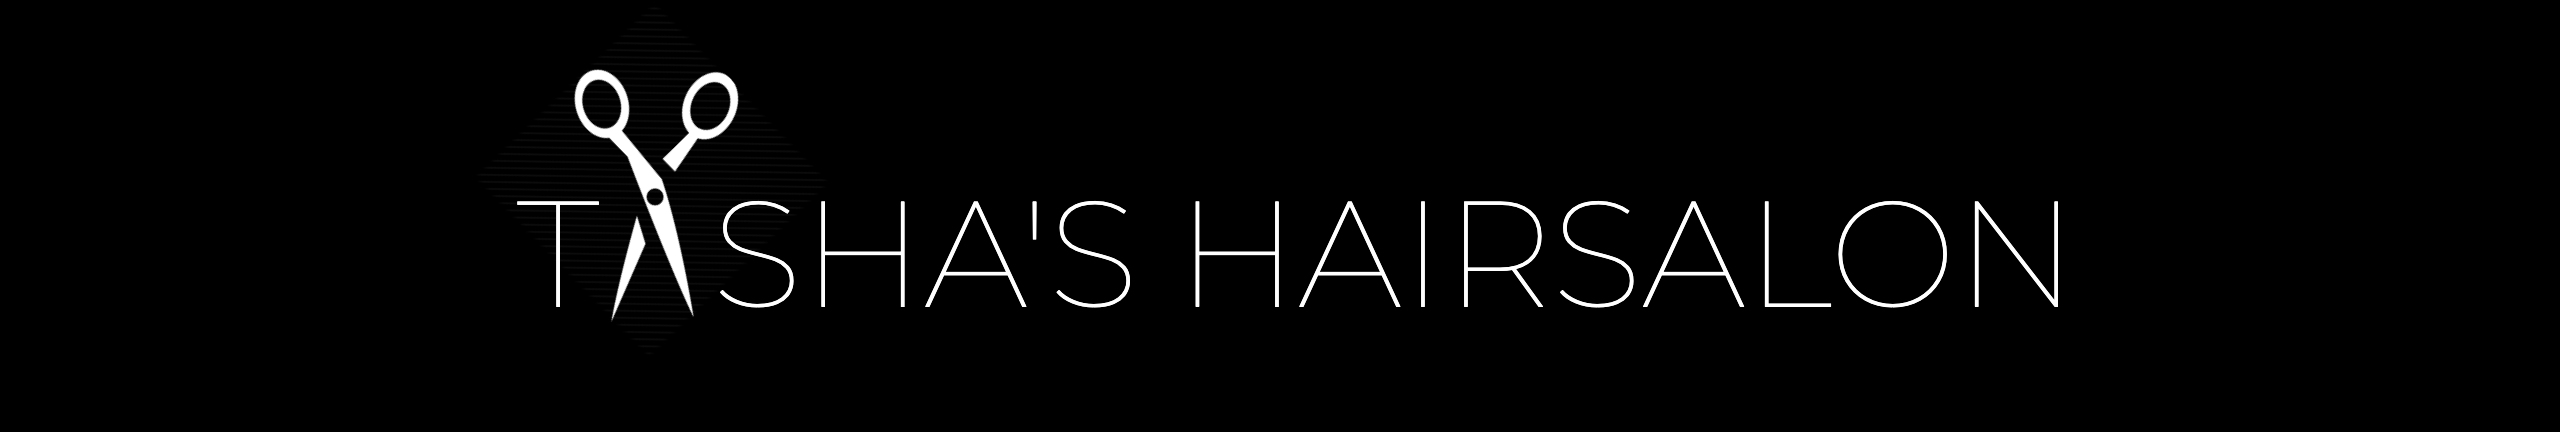 Tasha's Hairsalon